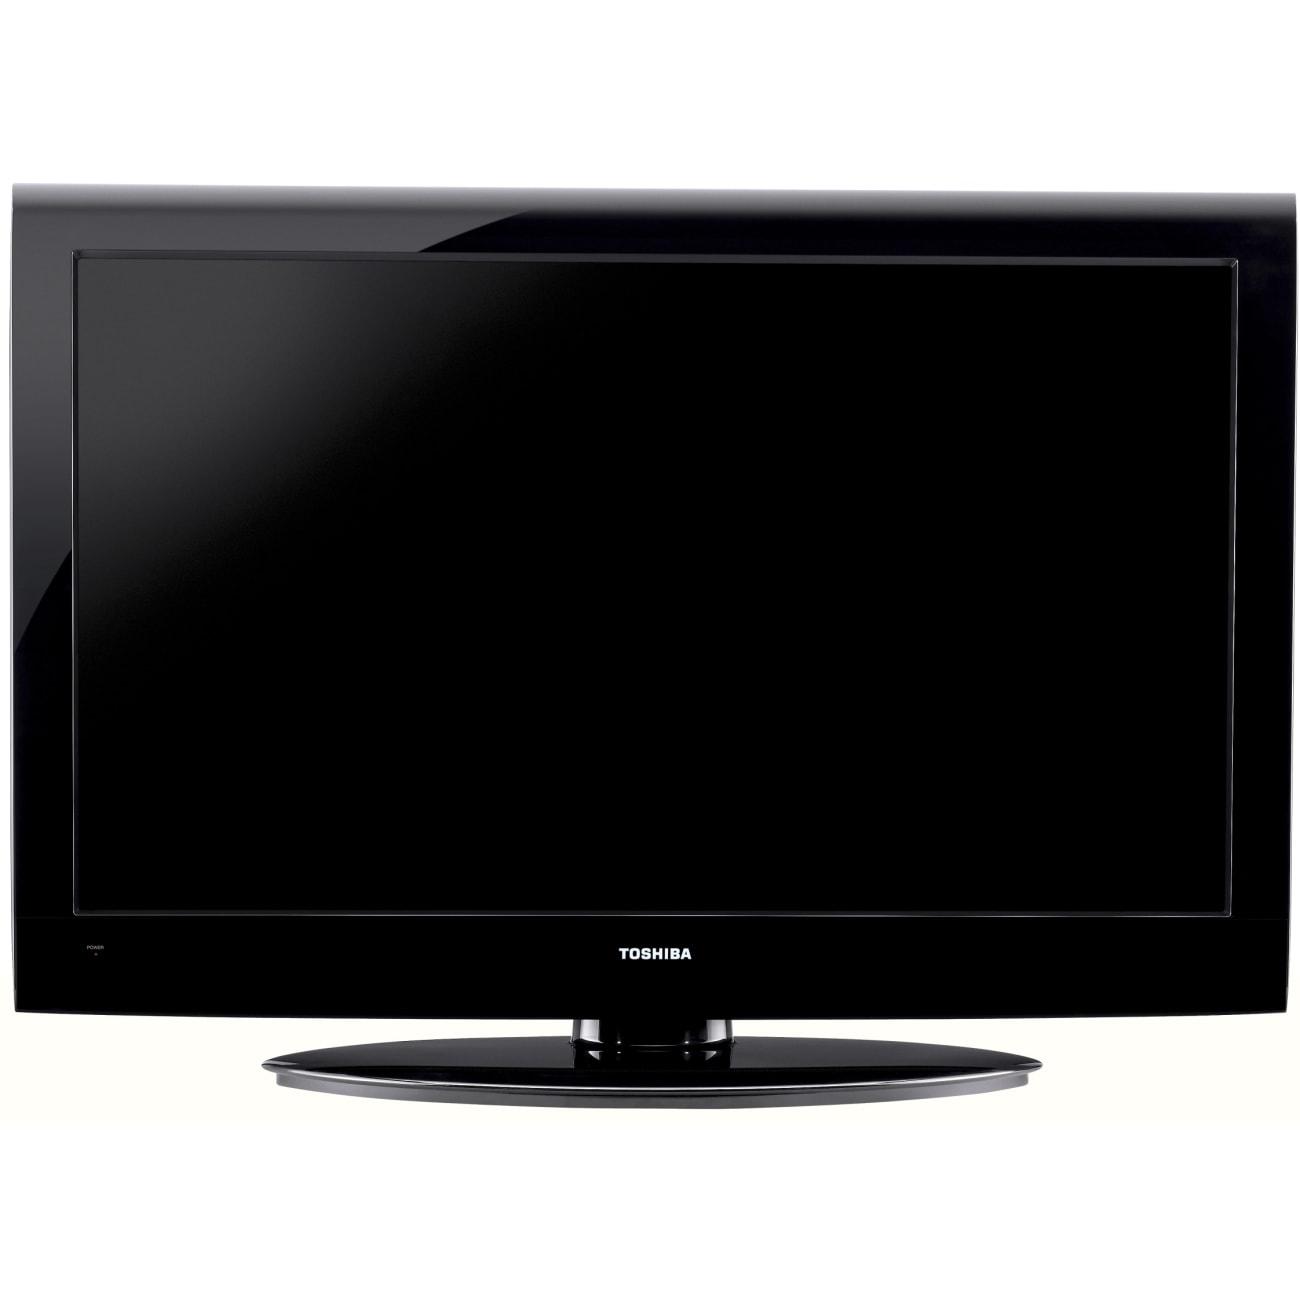 "Toshiba 65HT2U 65"" 1080p LCD TV - 16:9 (Refurbished)"